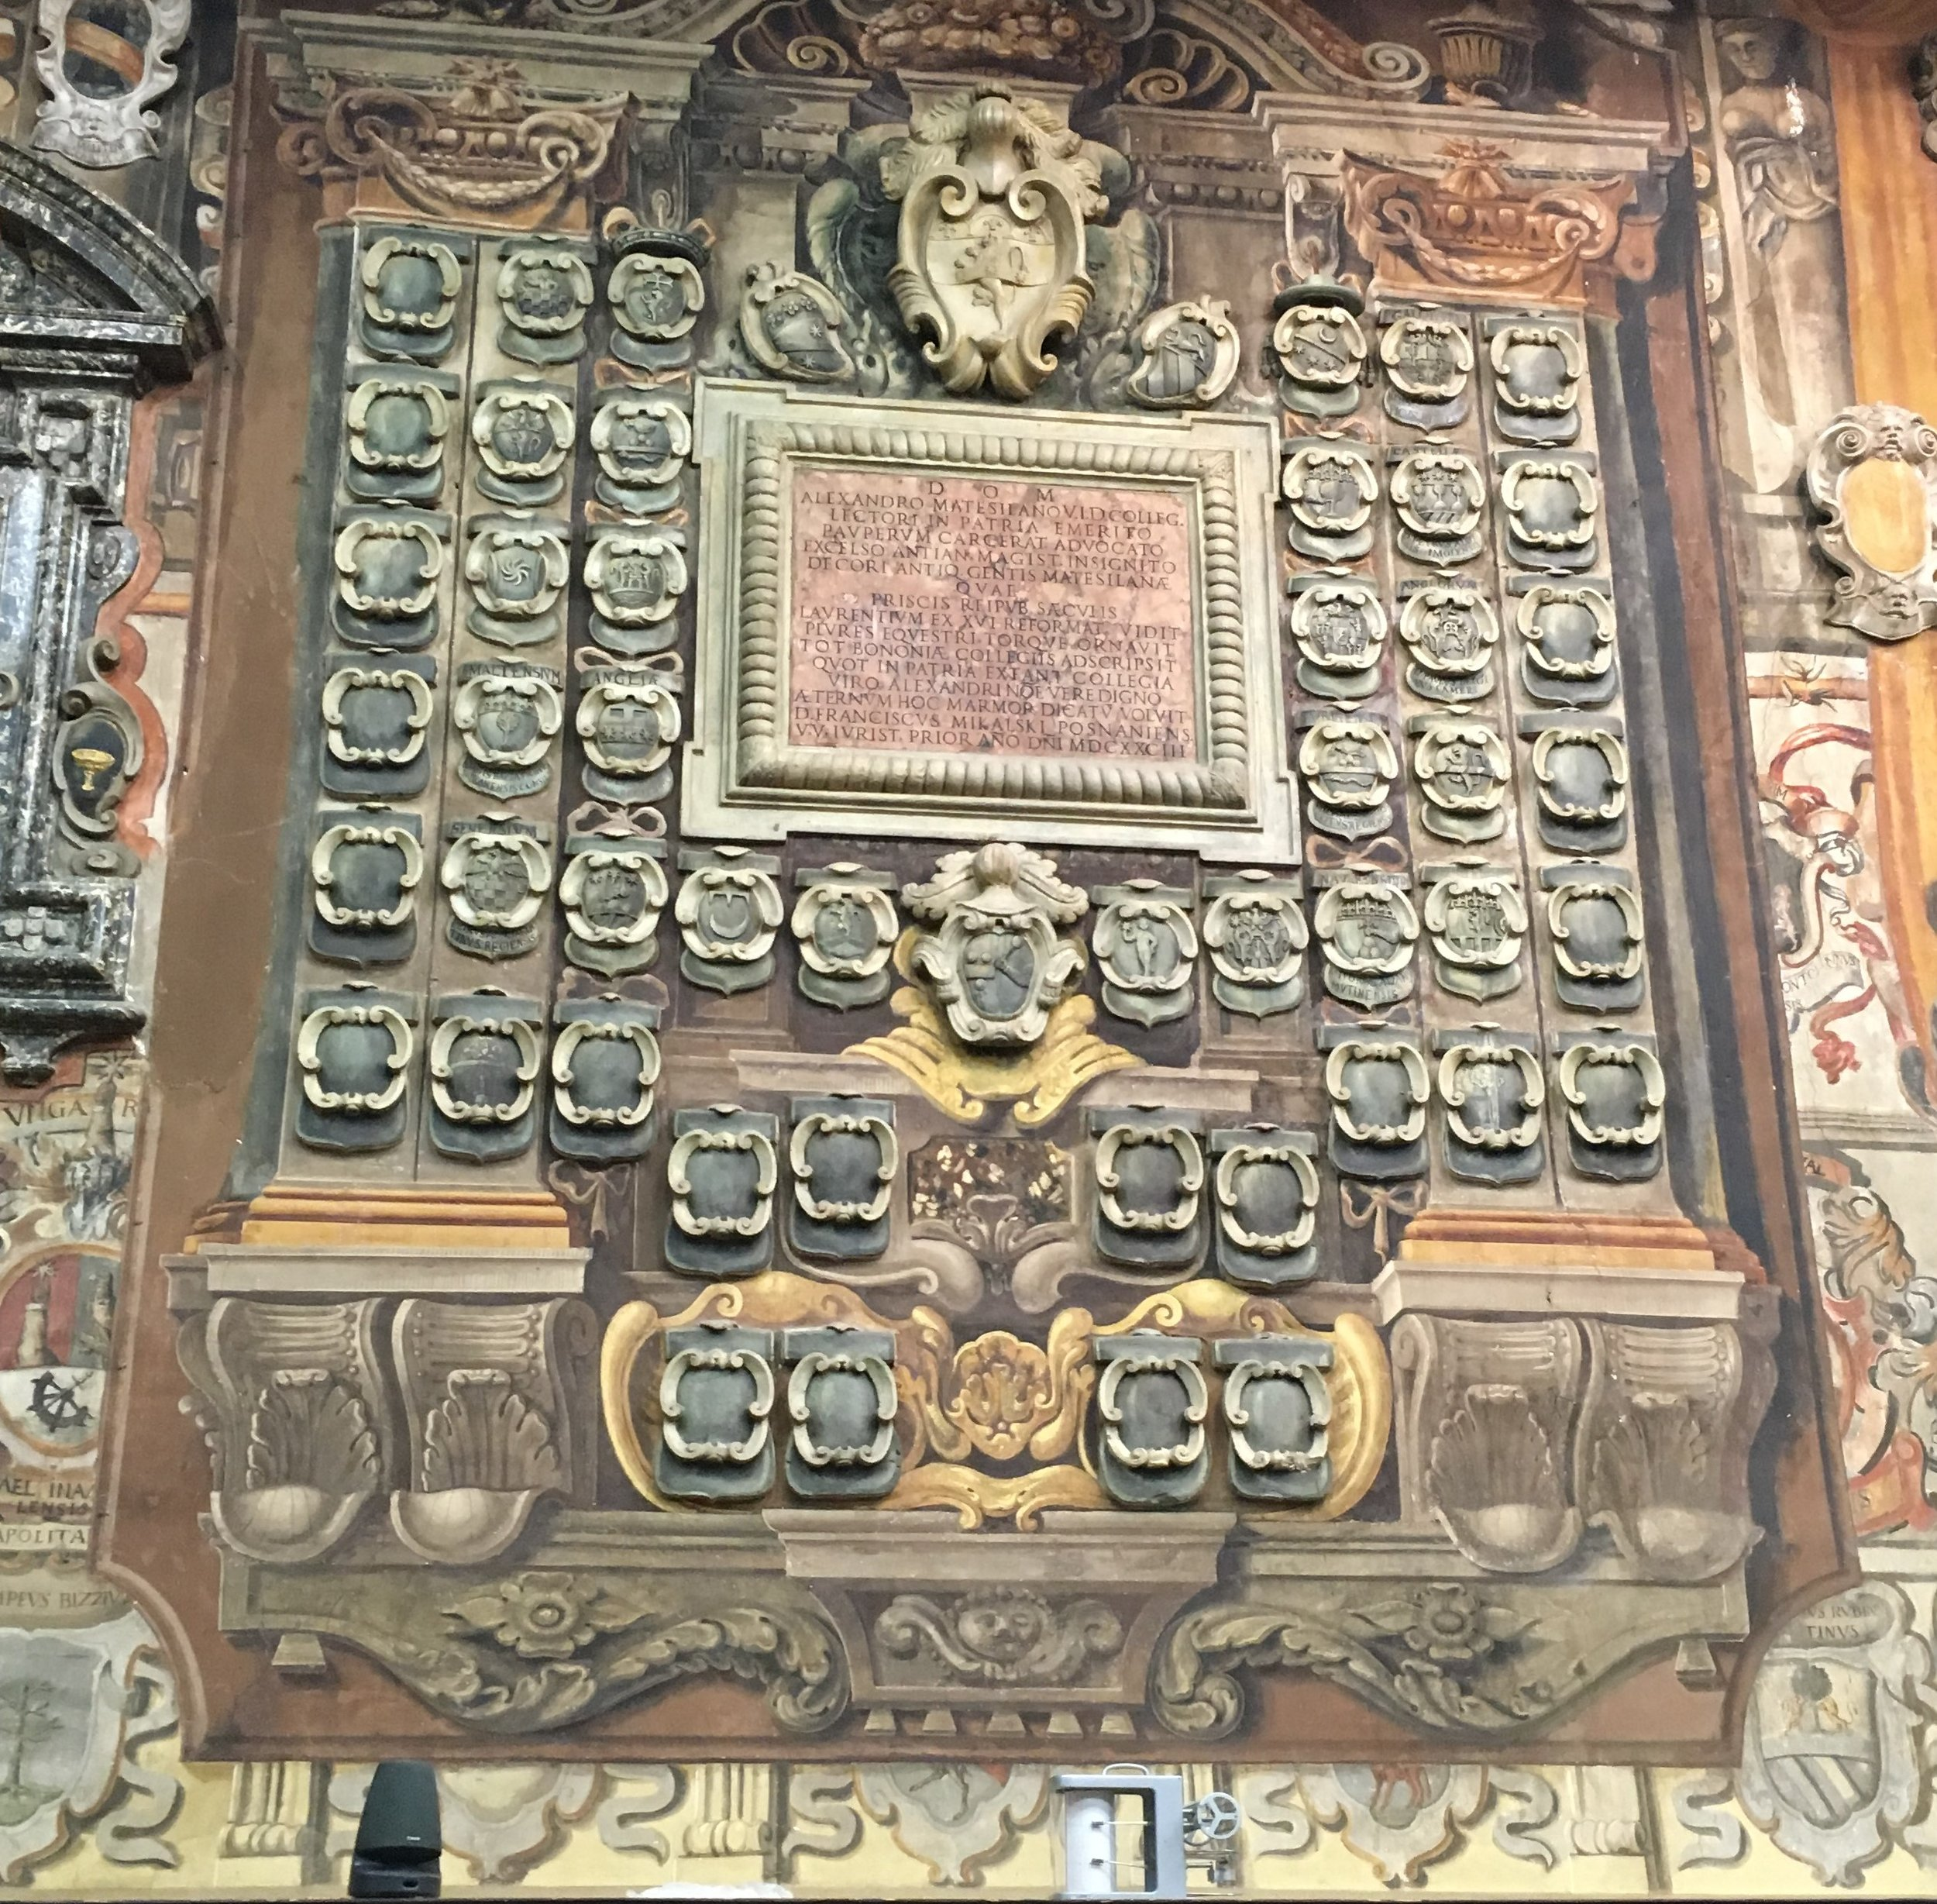 Family Crests Biblioteca dell'Archiginnasio